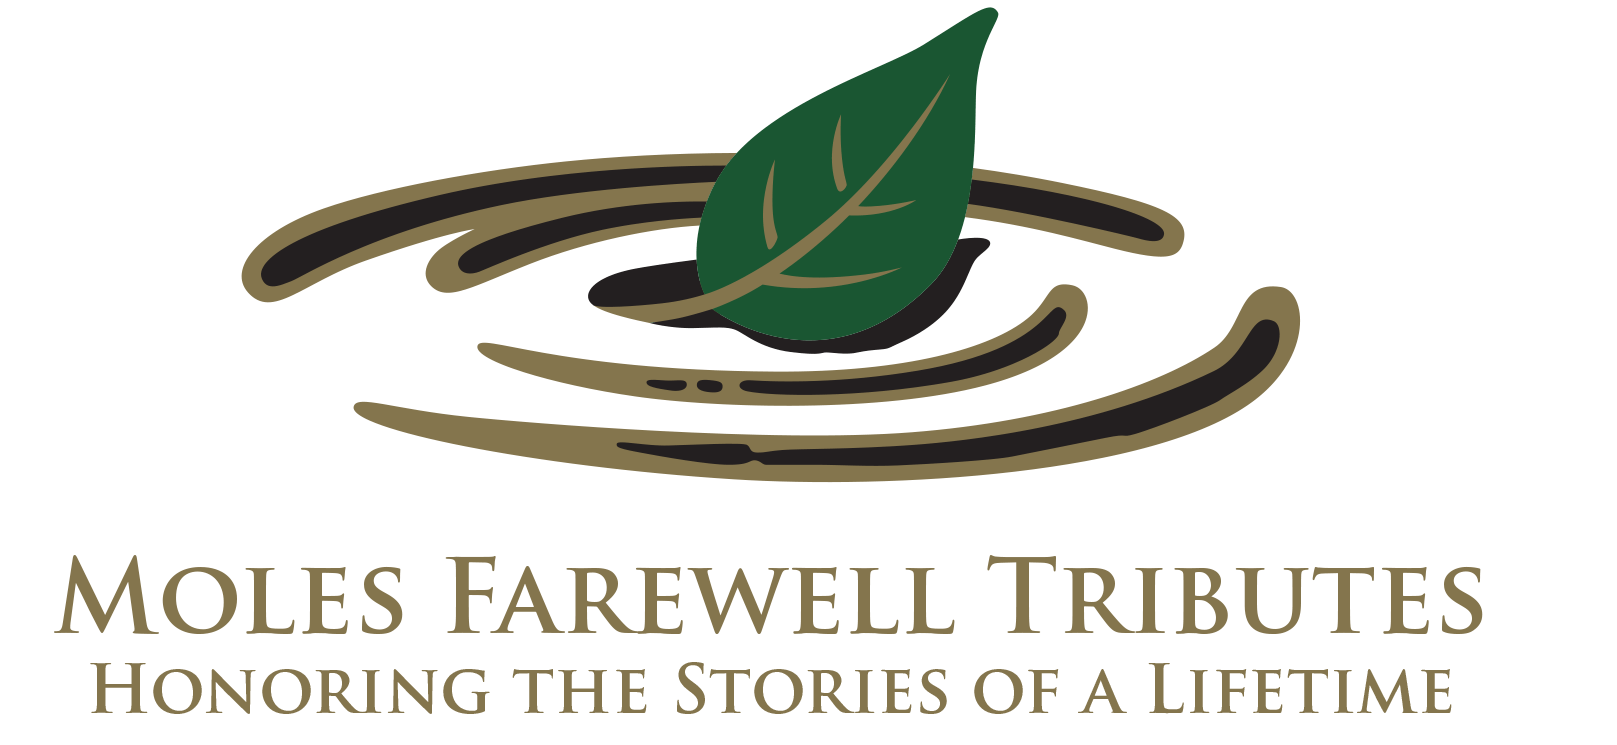 Moles Farewell Tributes SPOT